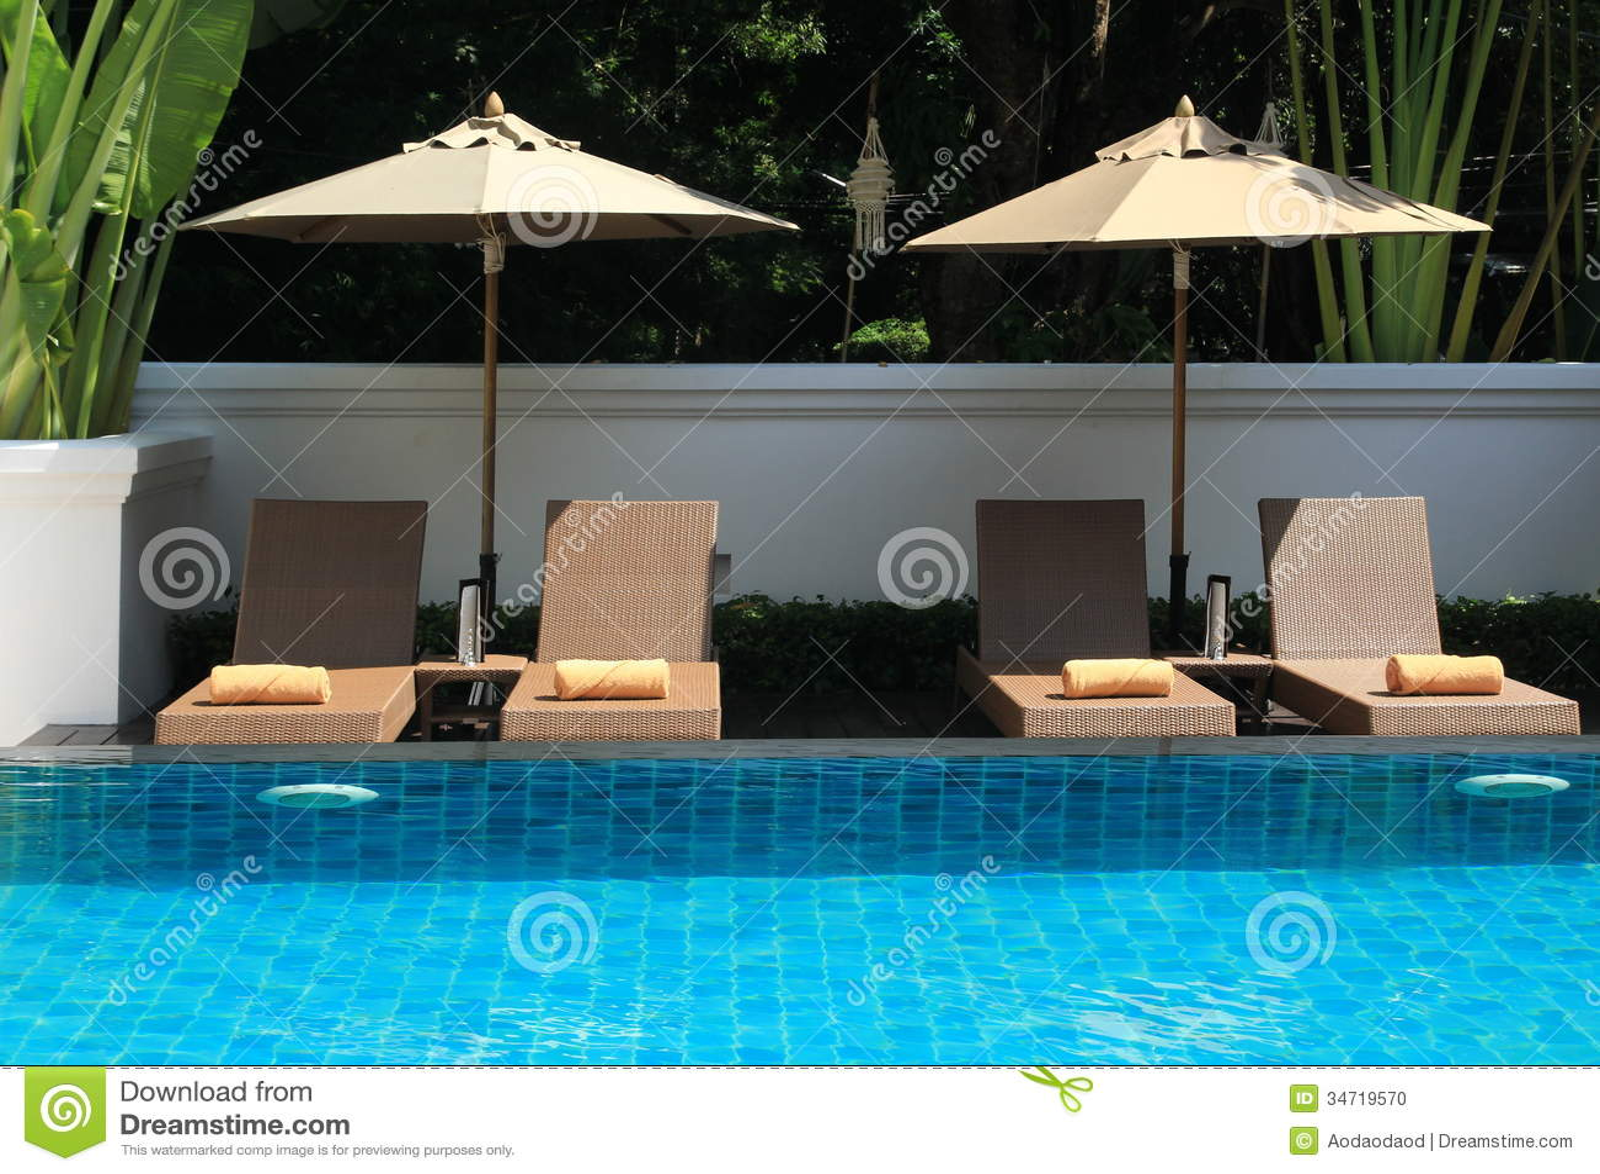 Swimming pool stock photo. Image of estate, real, brick ...